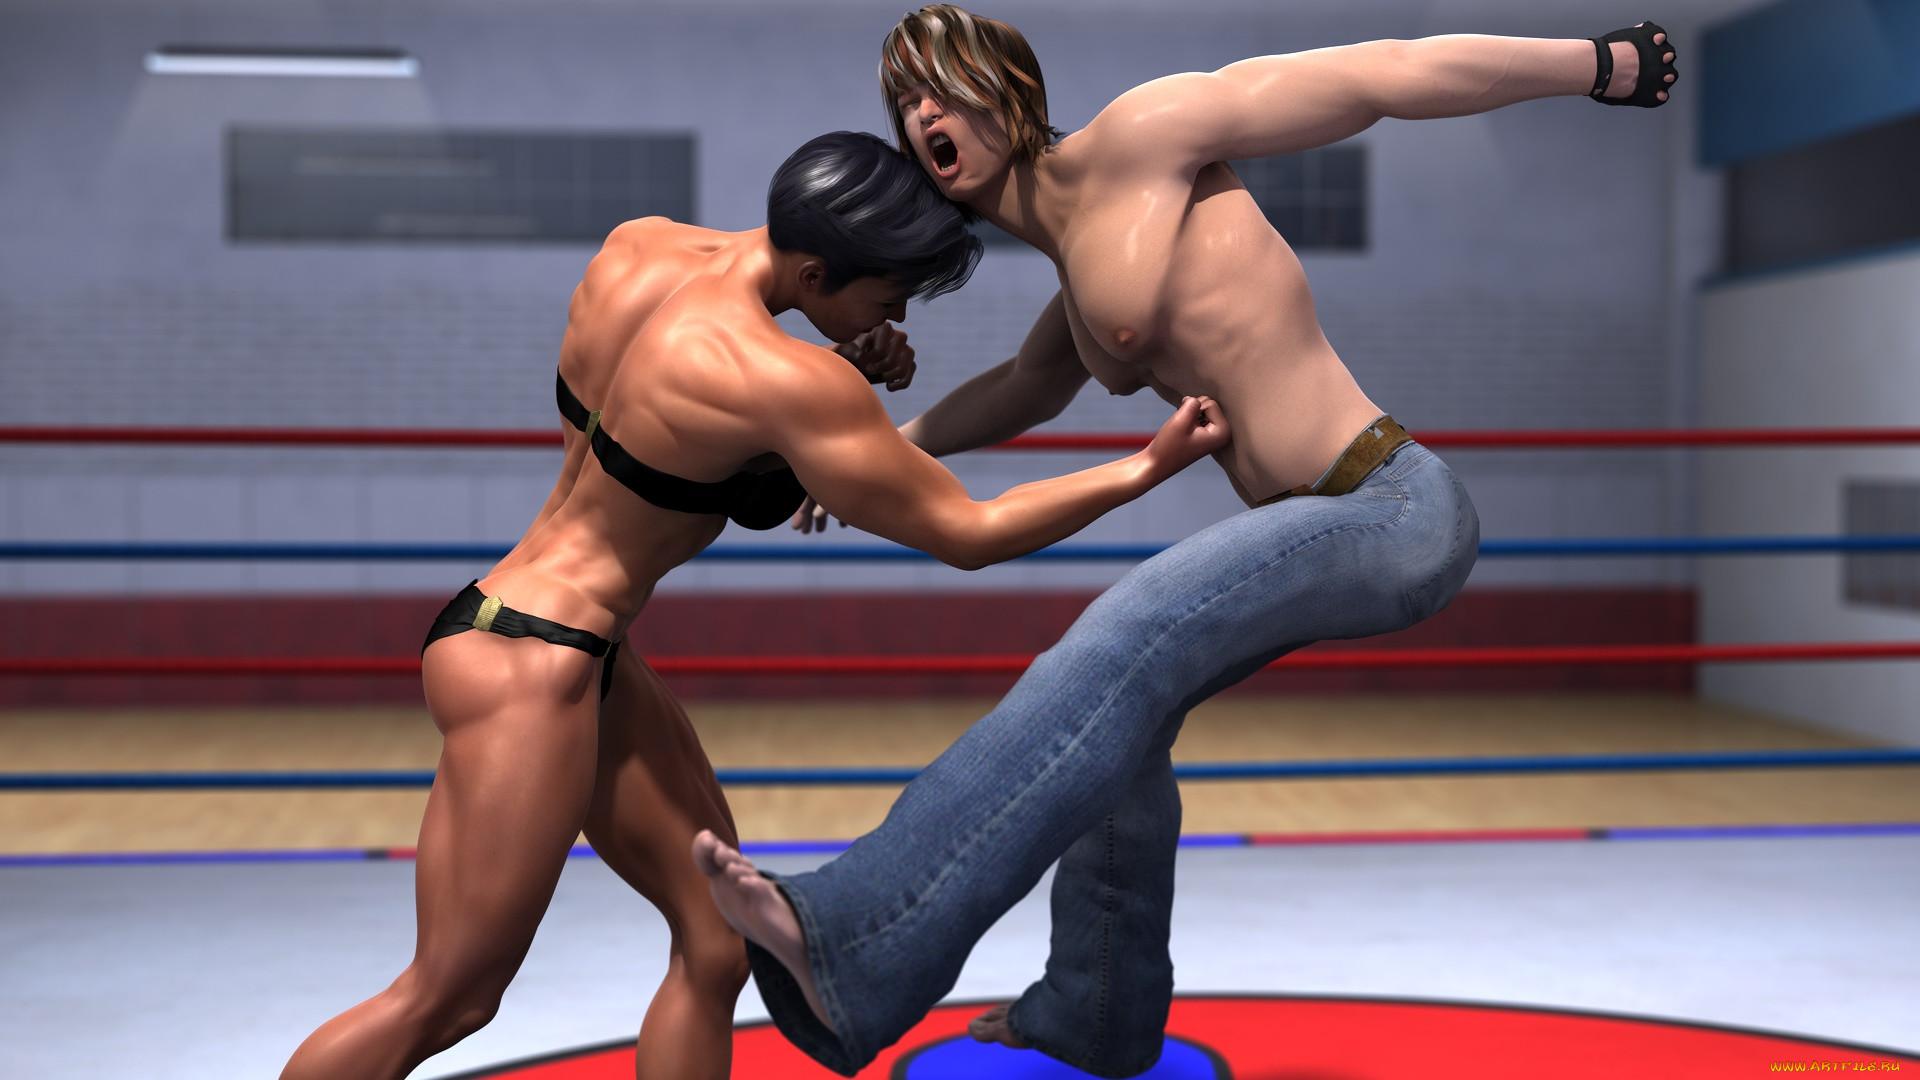 fighting Women naked